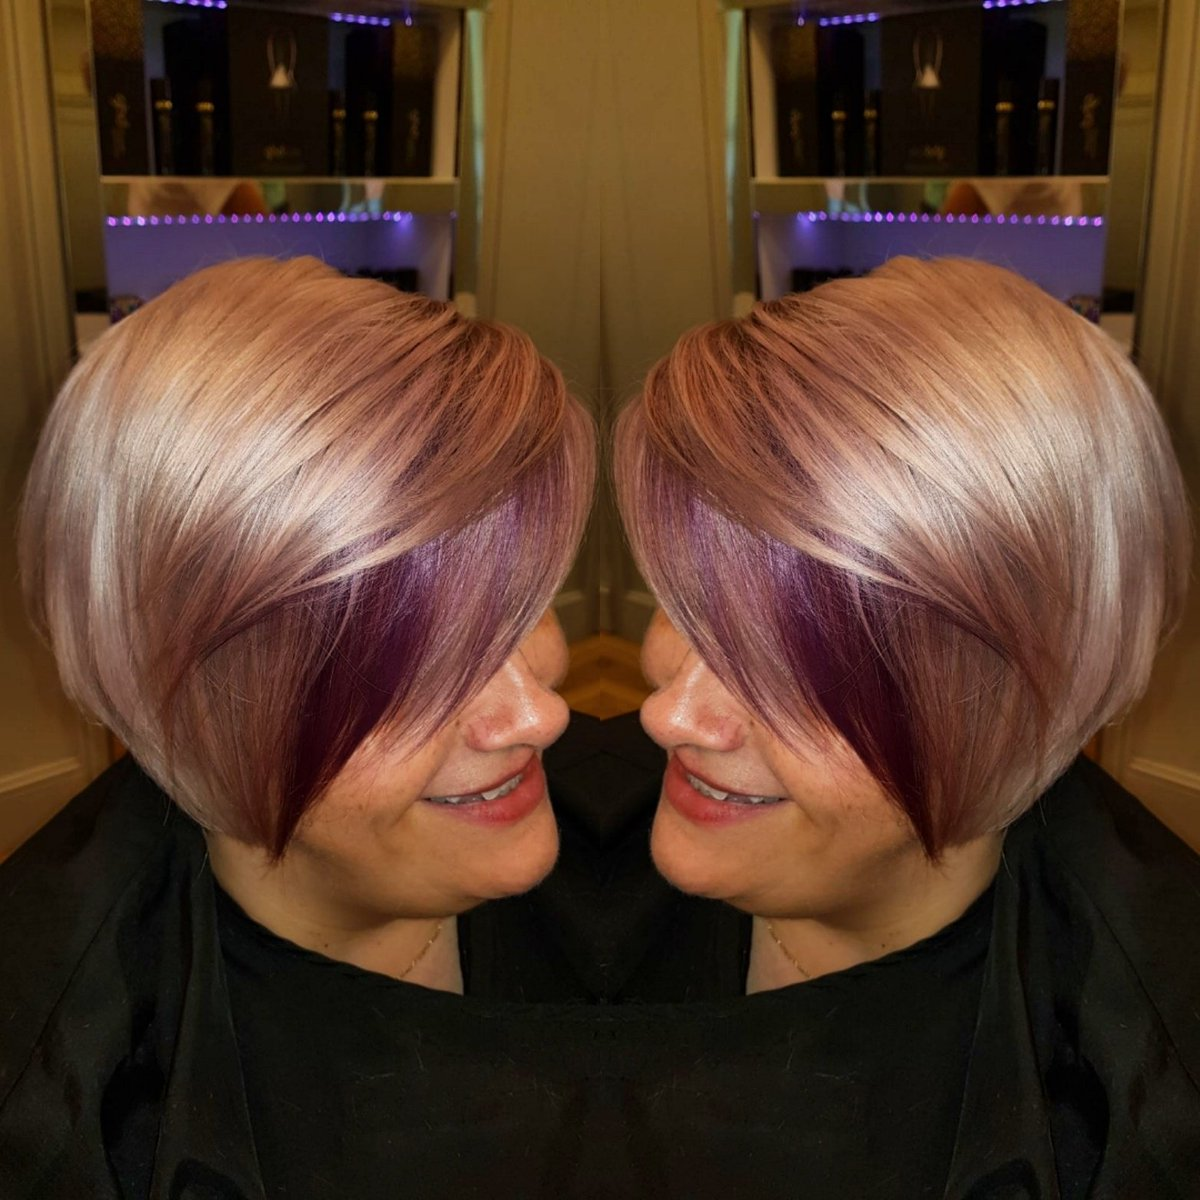   RUSH WIMBLEDON VILLAGE @RUSHHairBeauty #rush #rushhair #hair #boblife #colours #colourfulhair<br>http://pic.twitter.com/mvNipwejiv